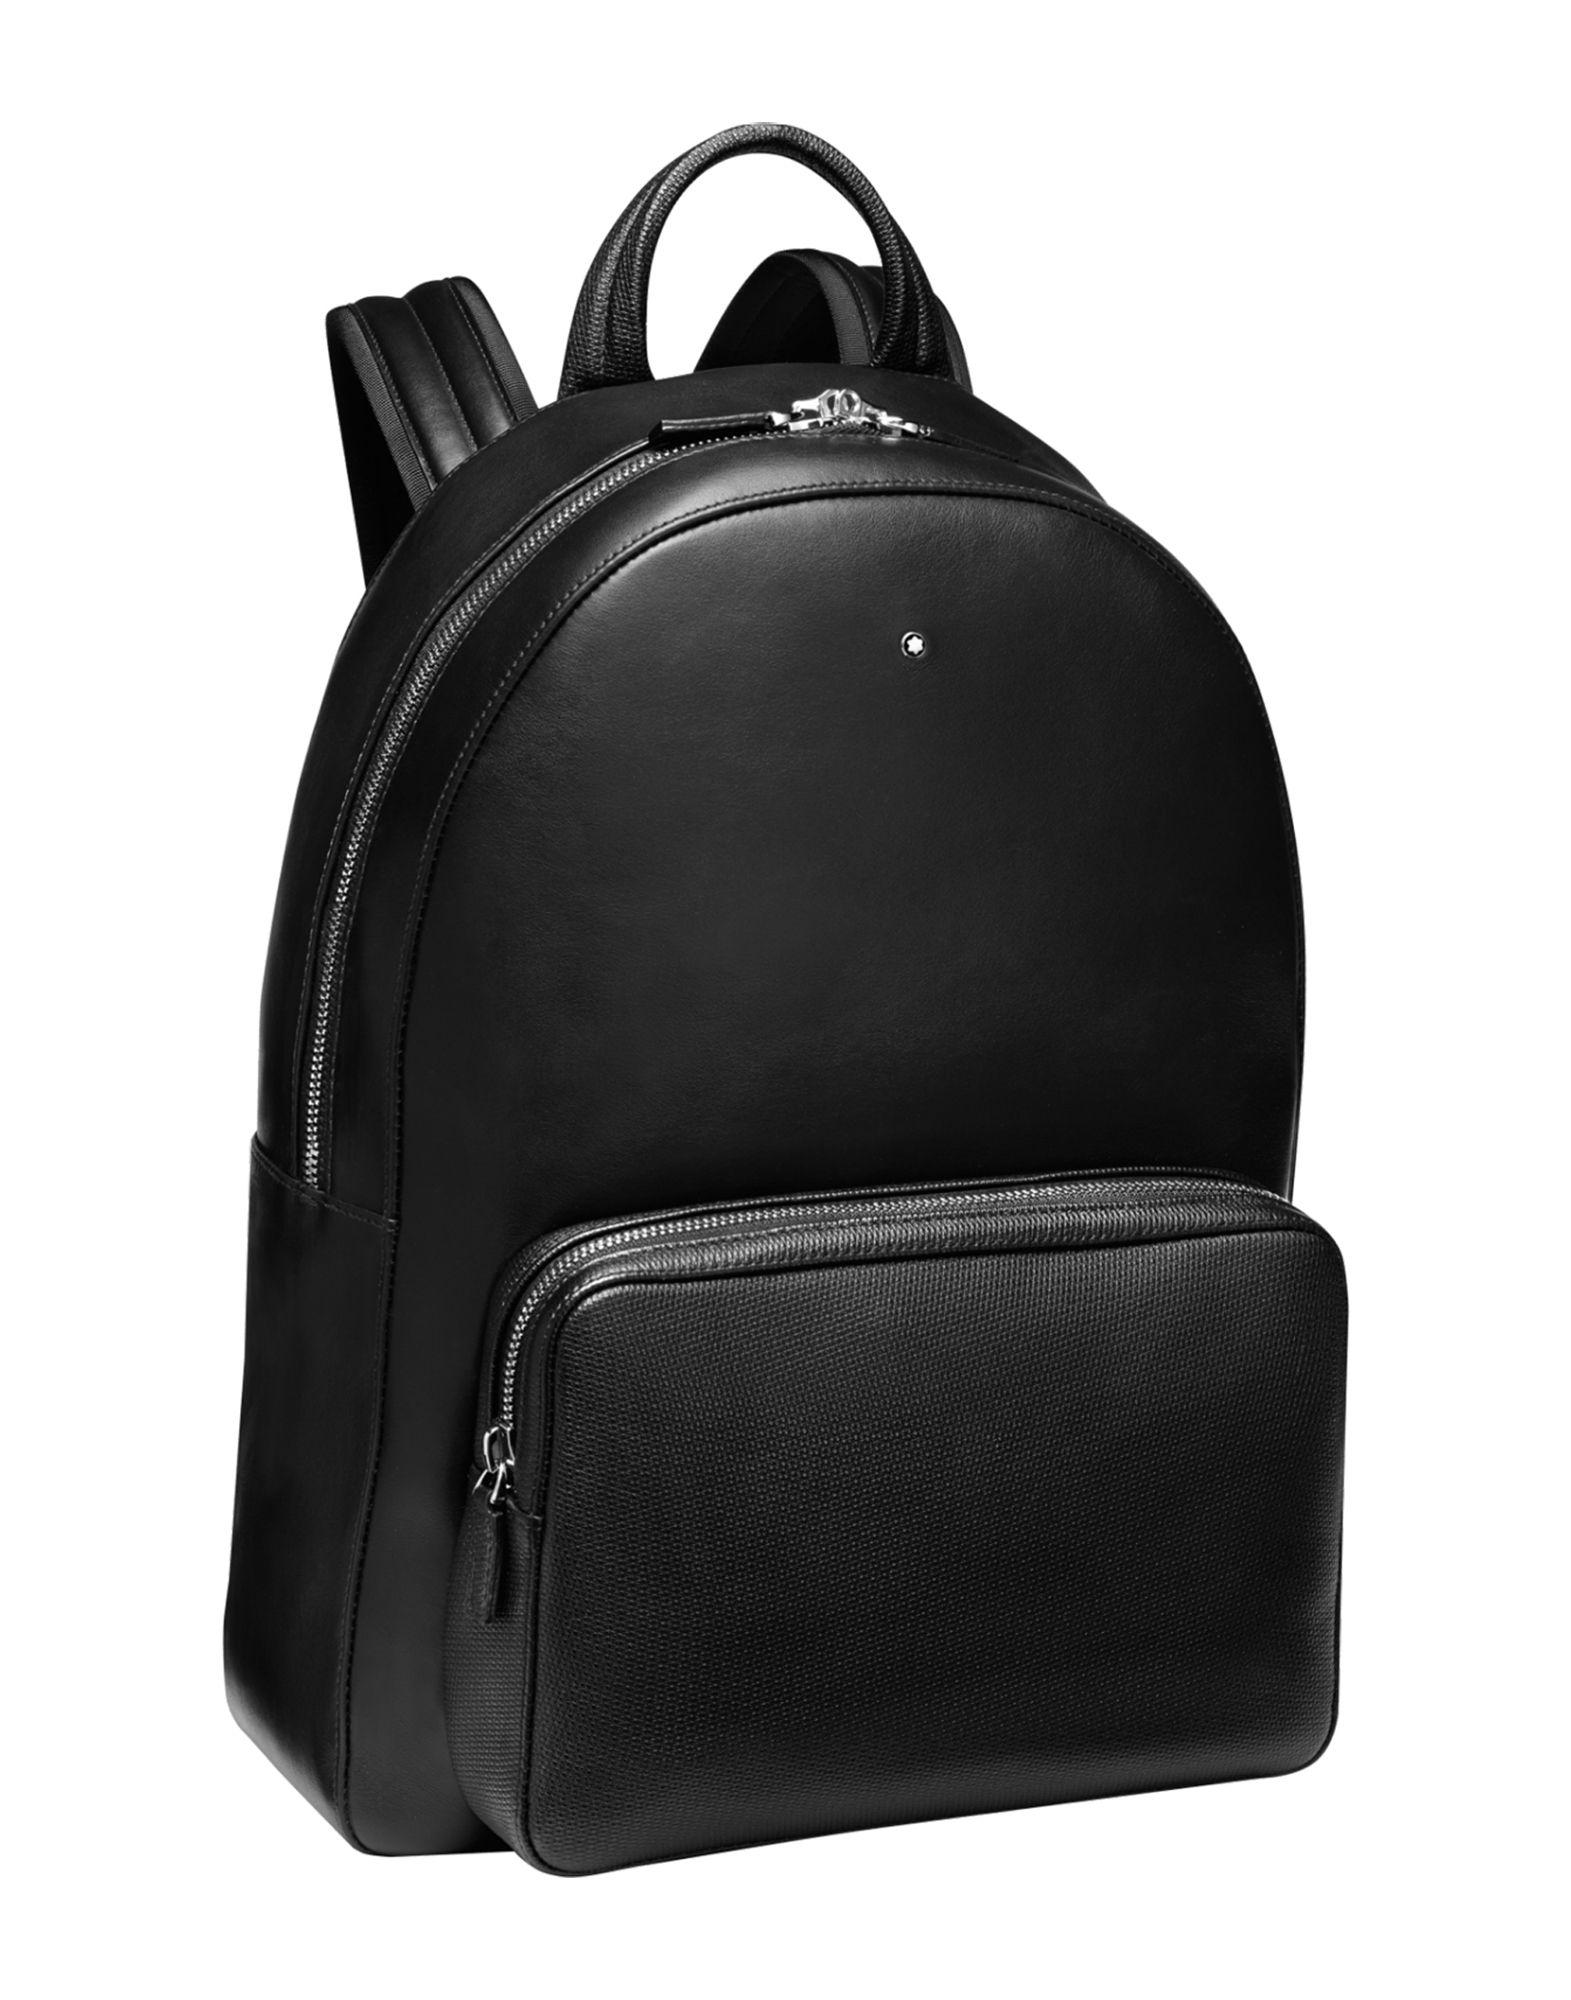 BAGS - Backpacks & Bum bags Montblanc K3wBwBG